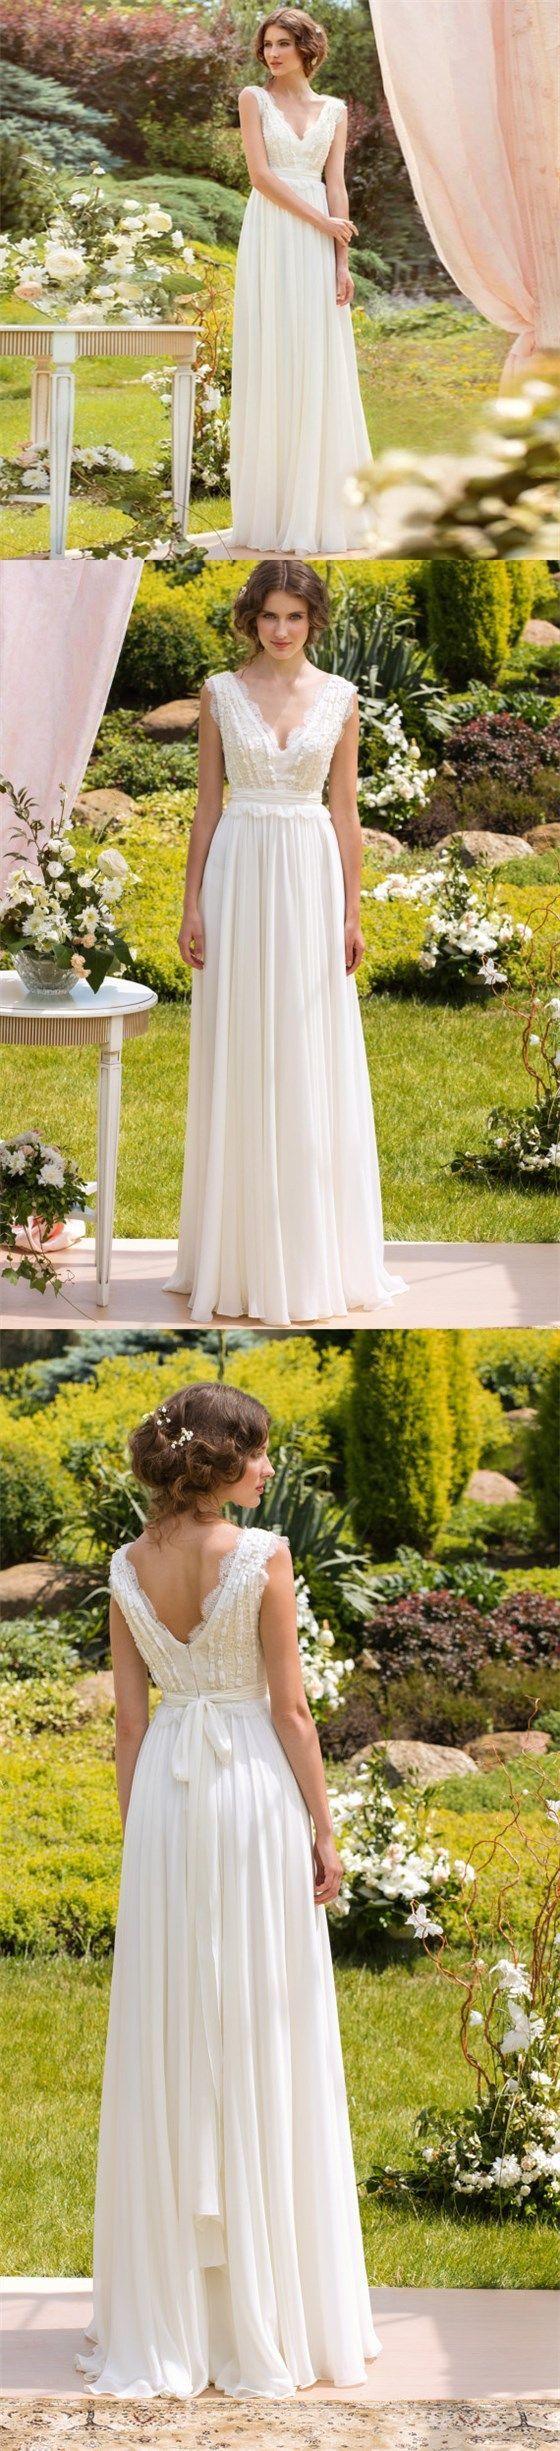 Wedding decorations rose gold october 2018 V Neck Long Simple Soft Fairy Pretty Charming Wedding dresses Long